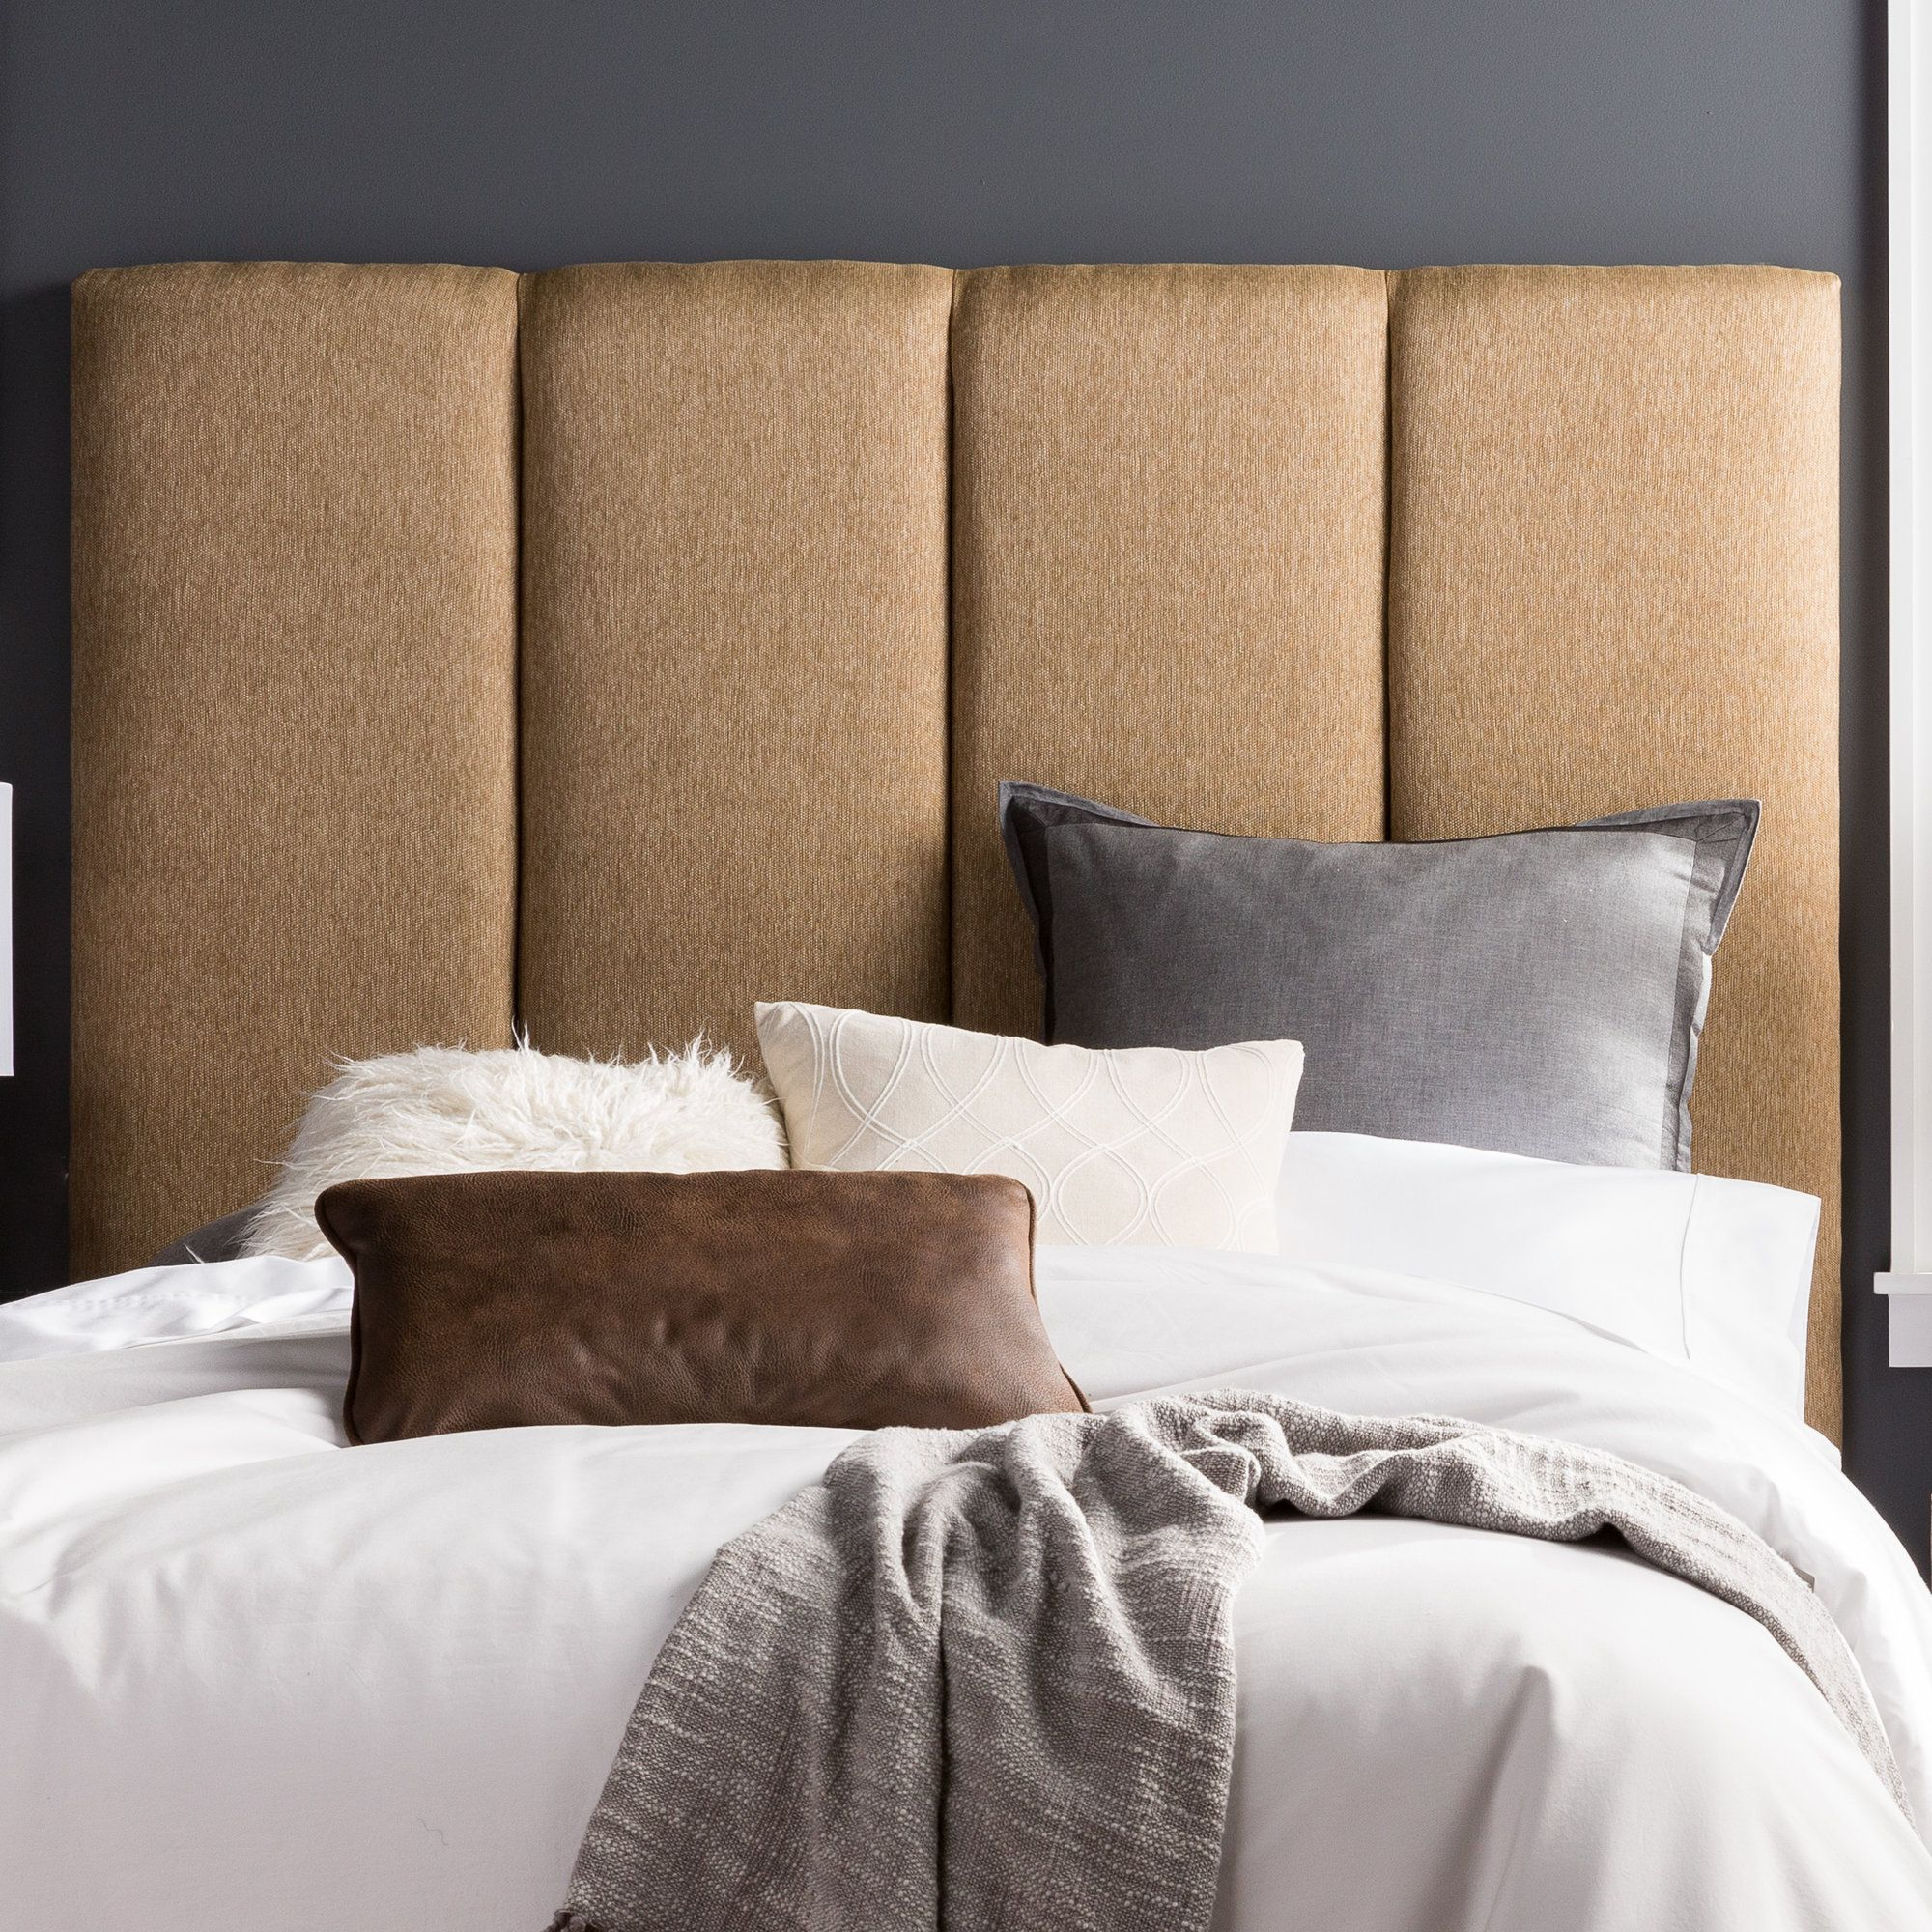 Best Lytle Upholstered Panel Headboard Cabeceira Cabeceiras 640 x 480